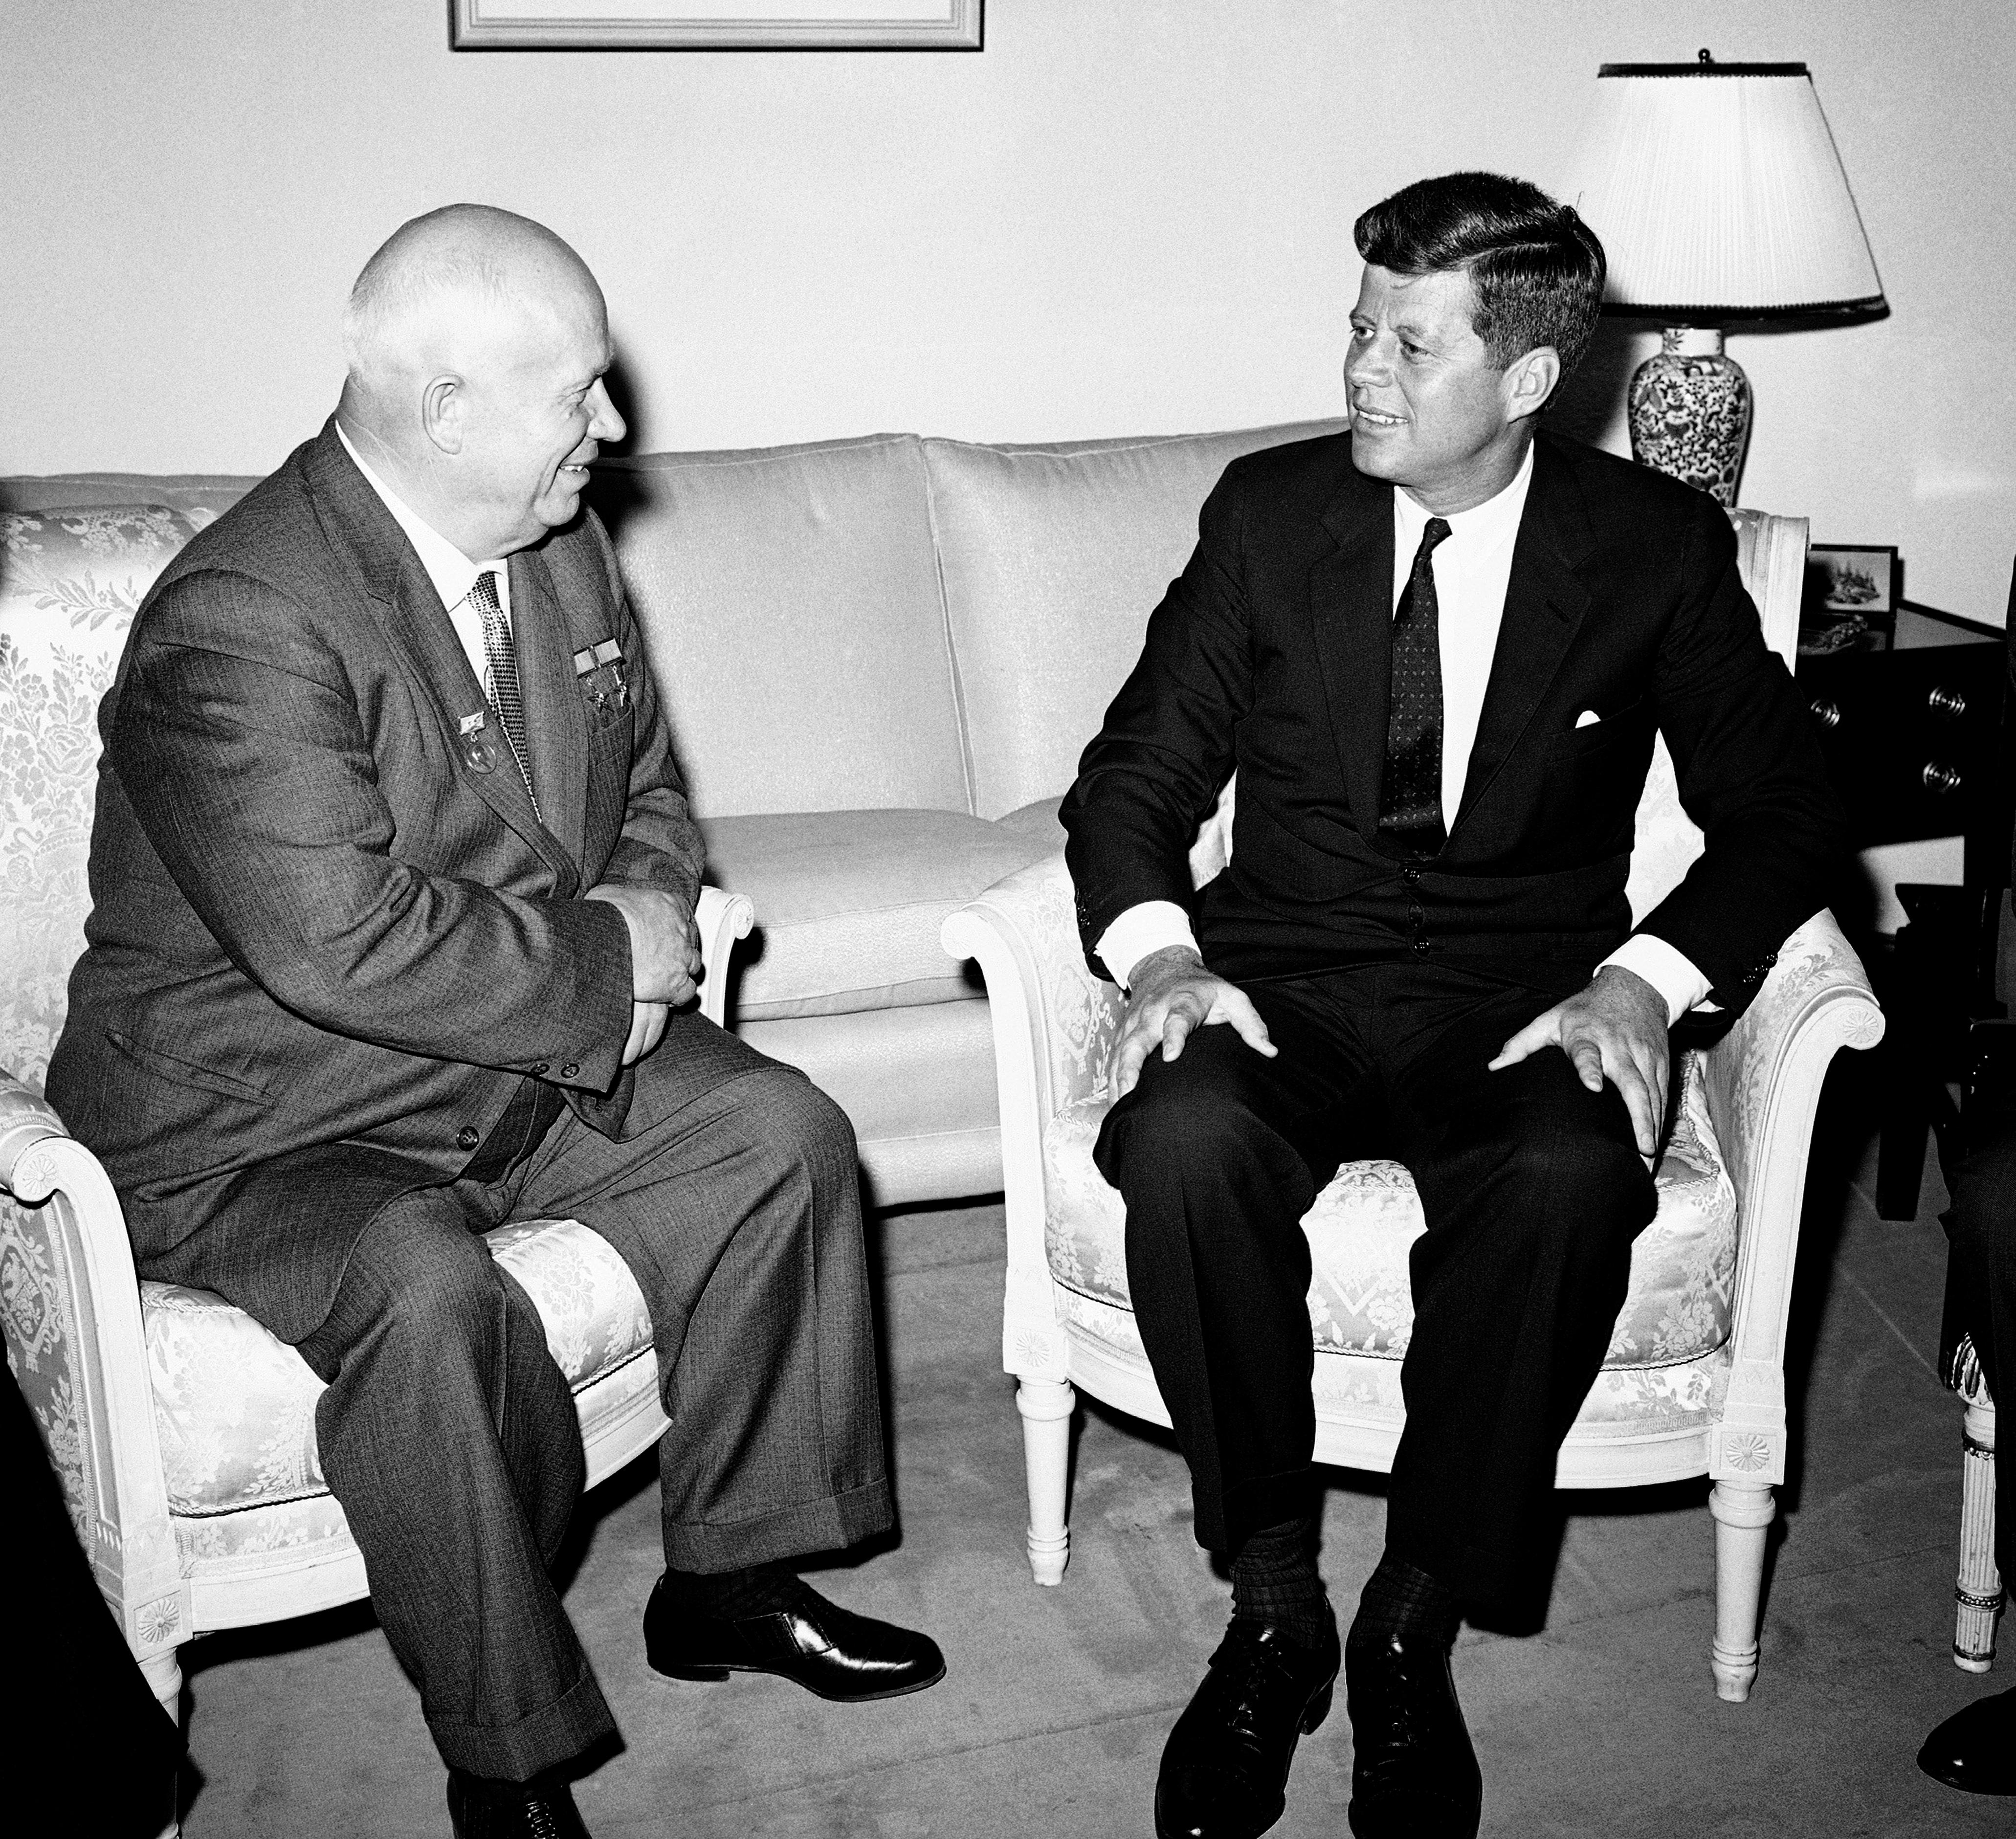 Soviet Premier Nikita Khrushchev and President John F. Kennedy talk in the residence of the U.S. Ambassador in a suburb of Vienna